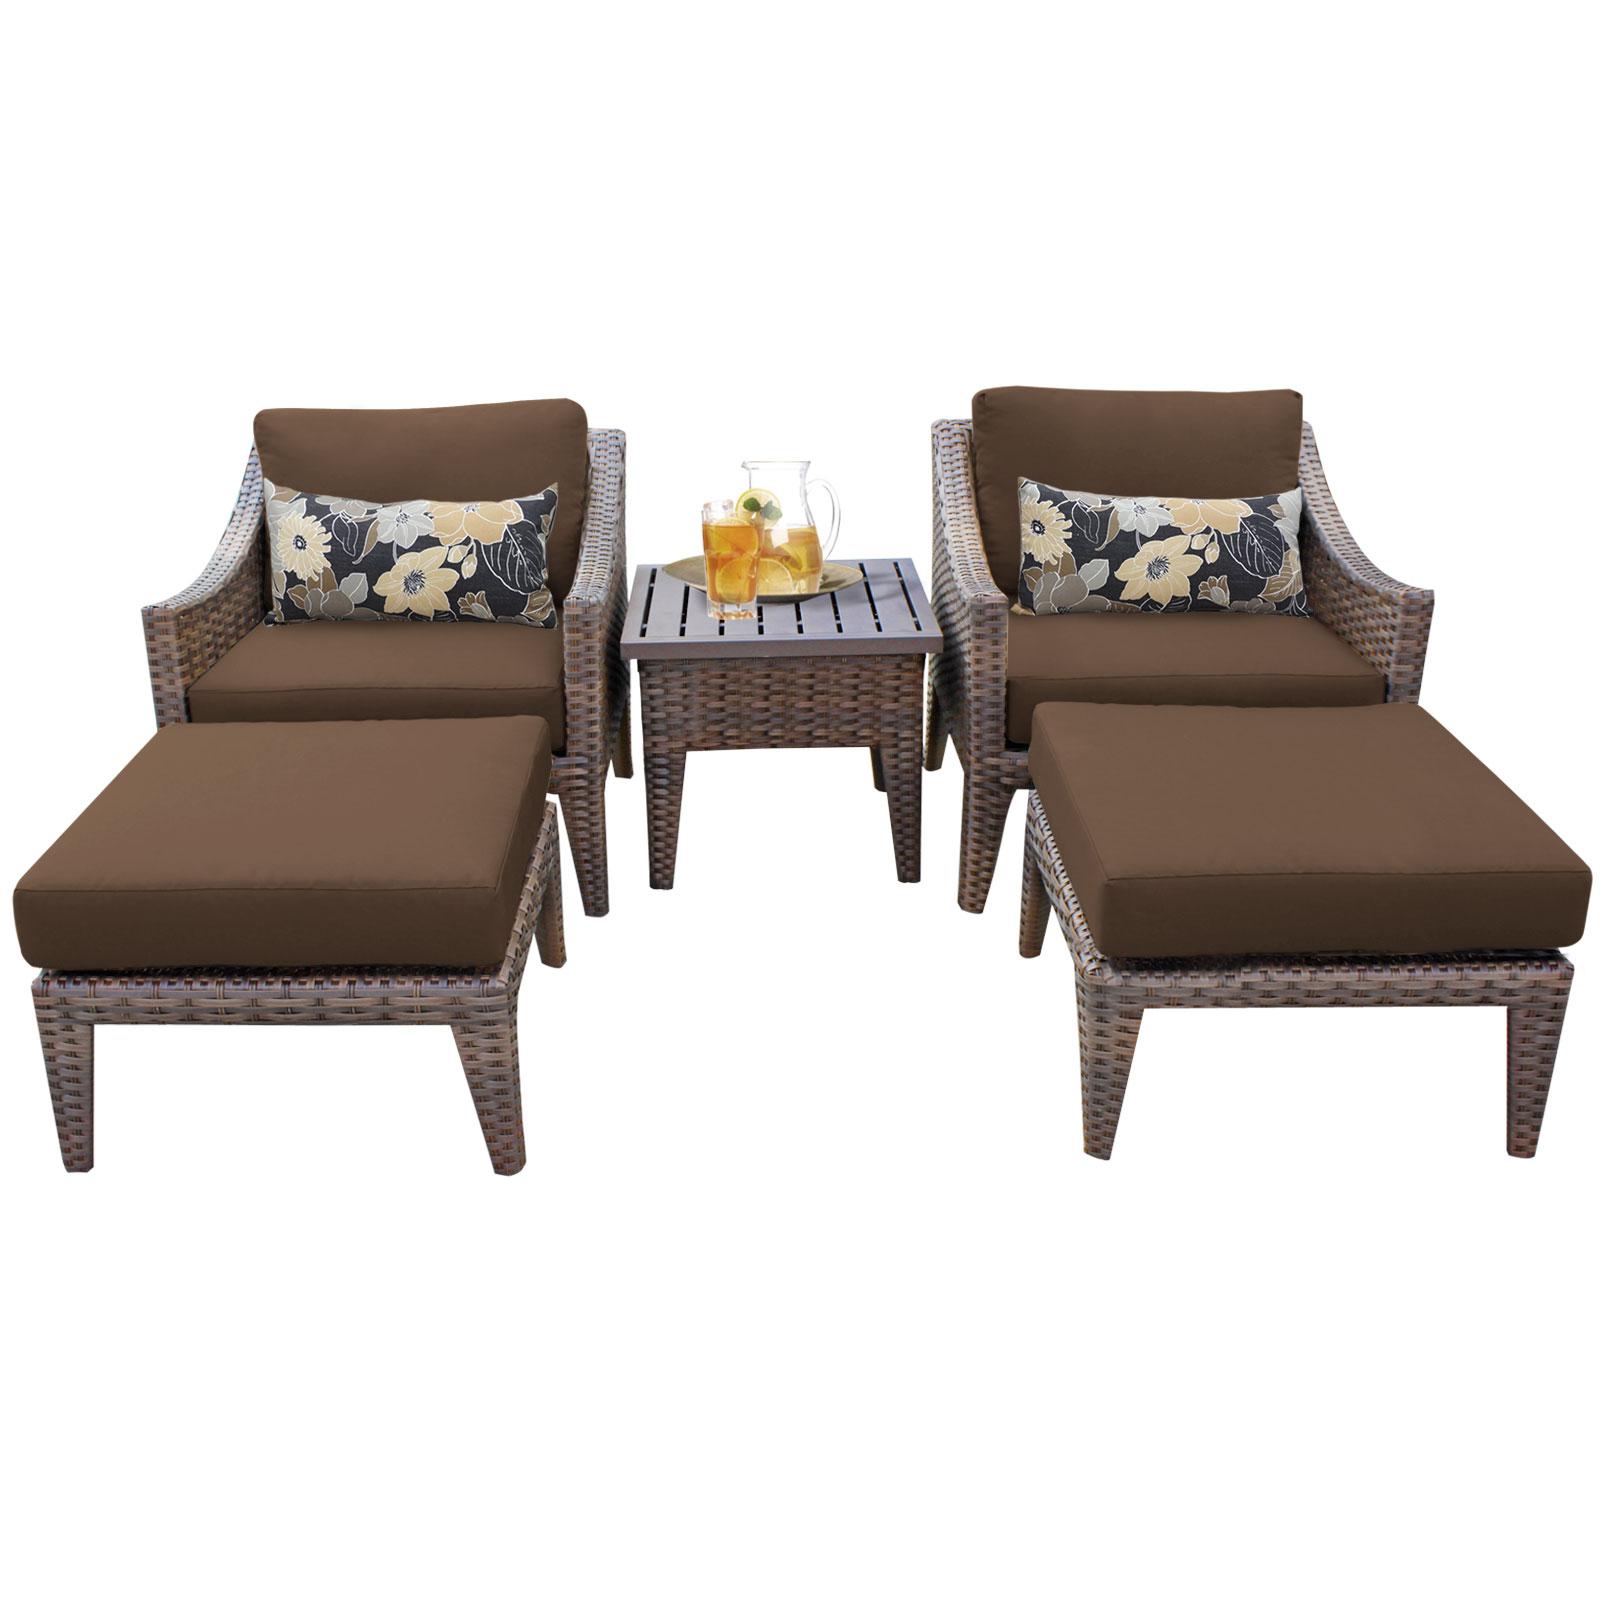 walmart wicker patio furniture sets Soho 5 Piece Outdoor Wicker Patio Furniture Set 05e